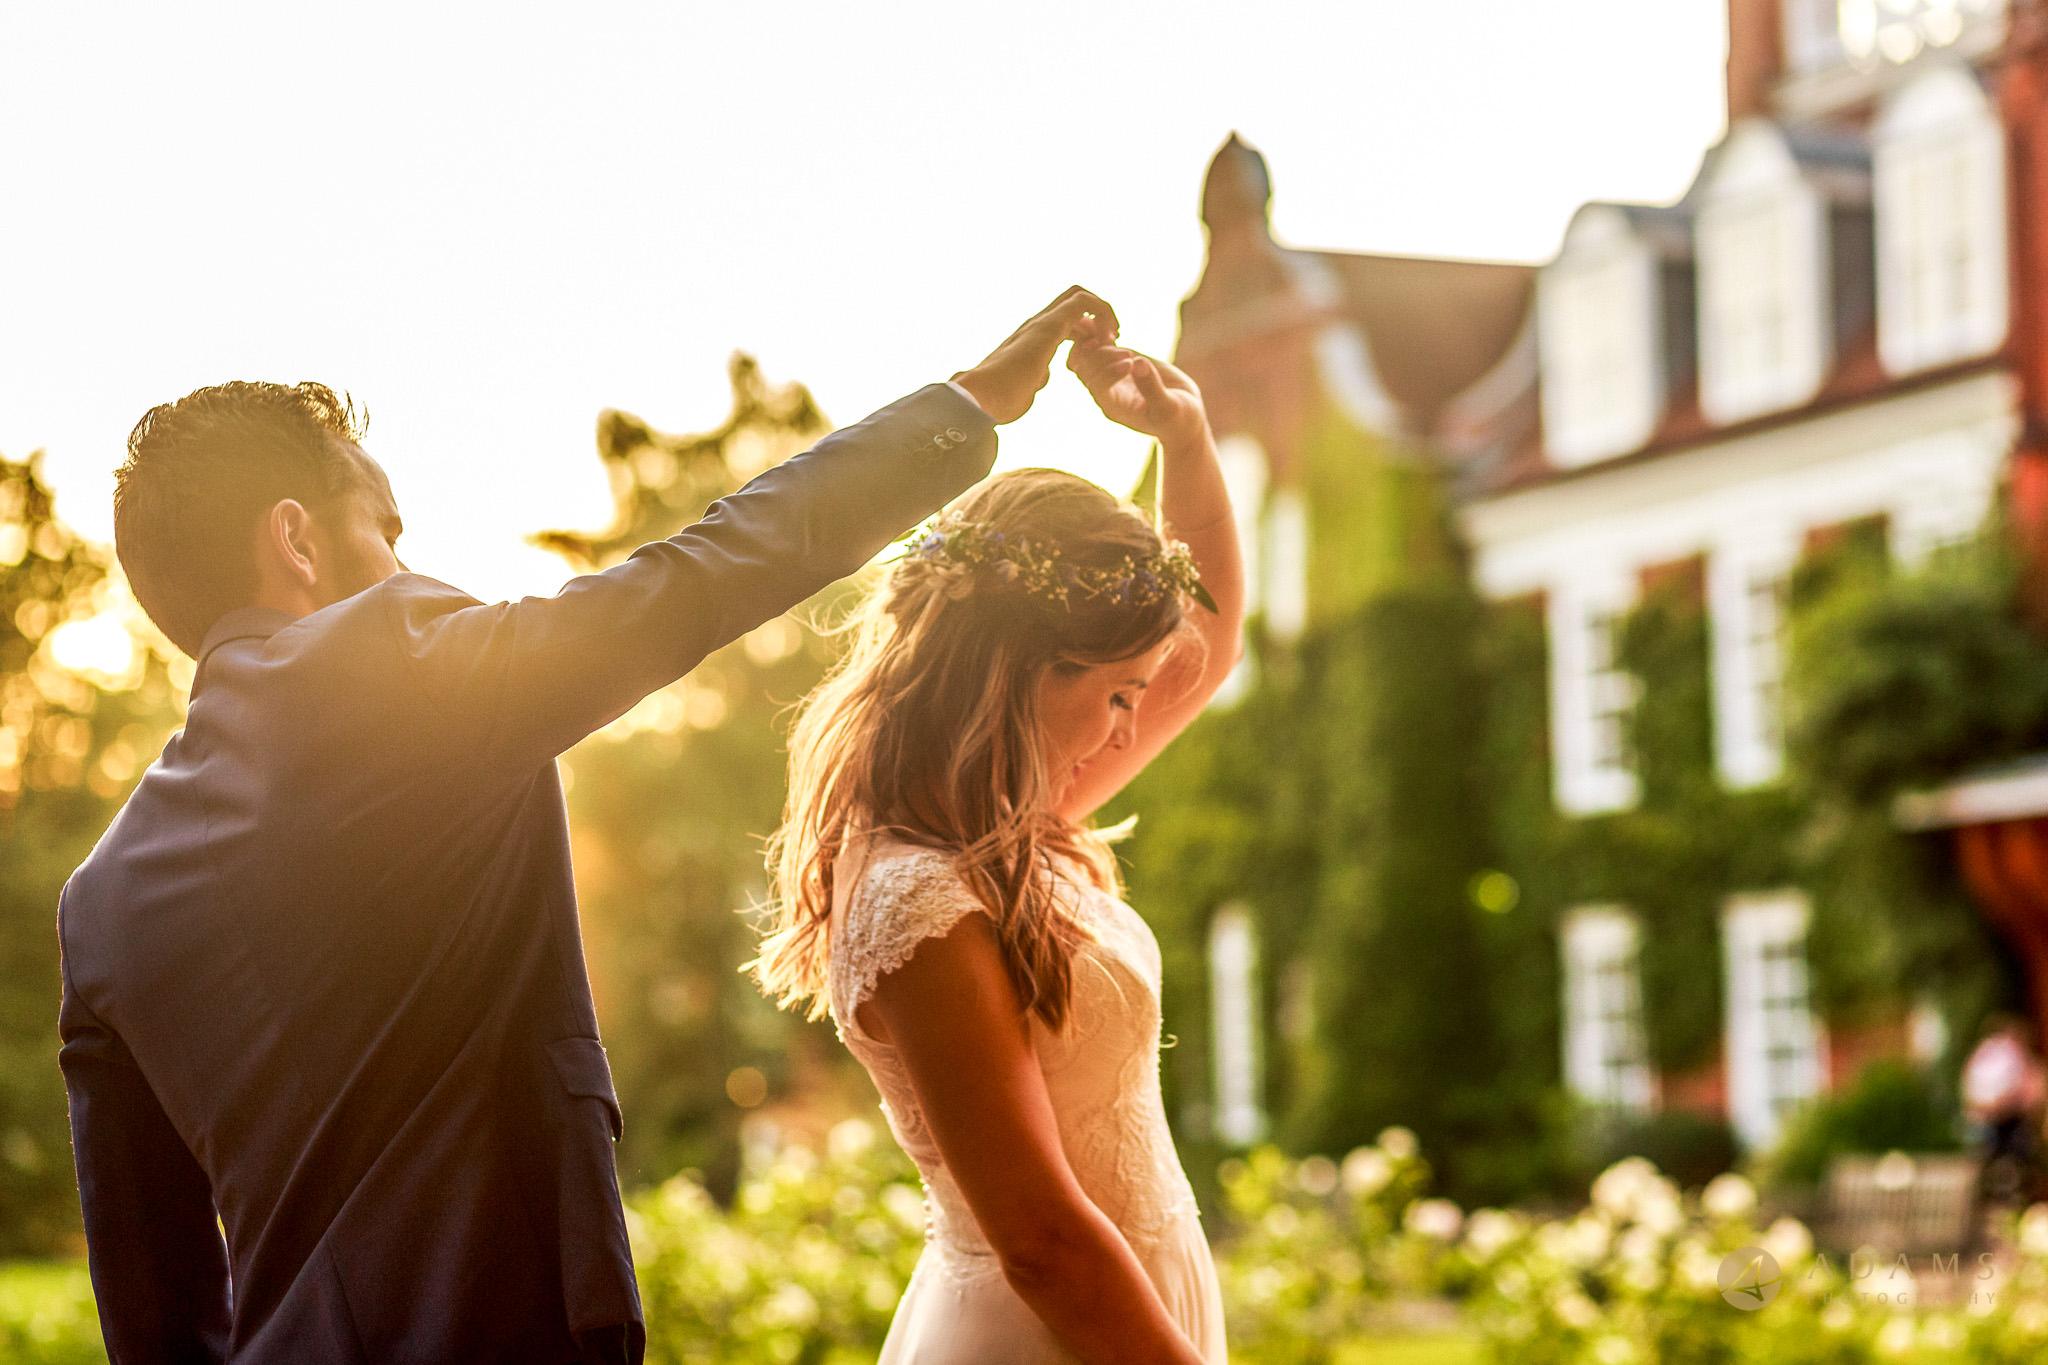 Wedding photographer Cambridge Newnham College couple dancing in the sun